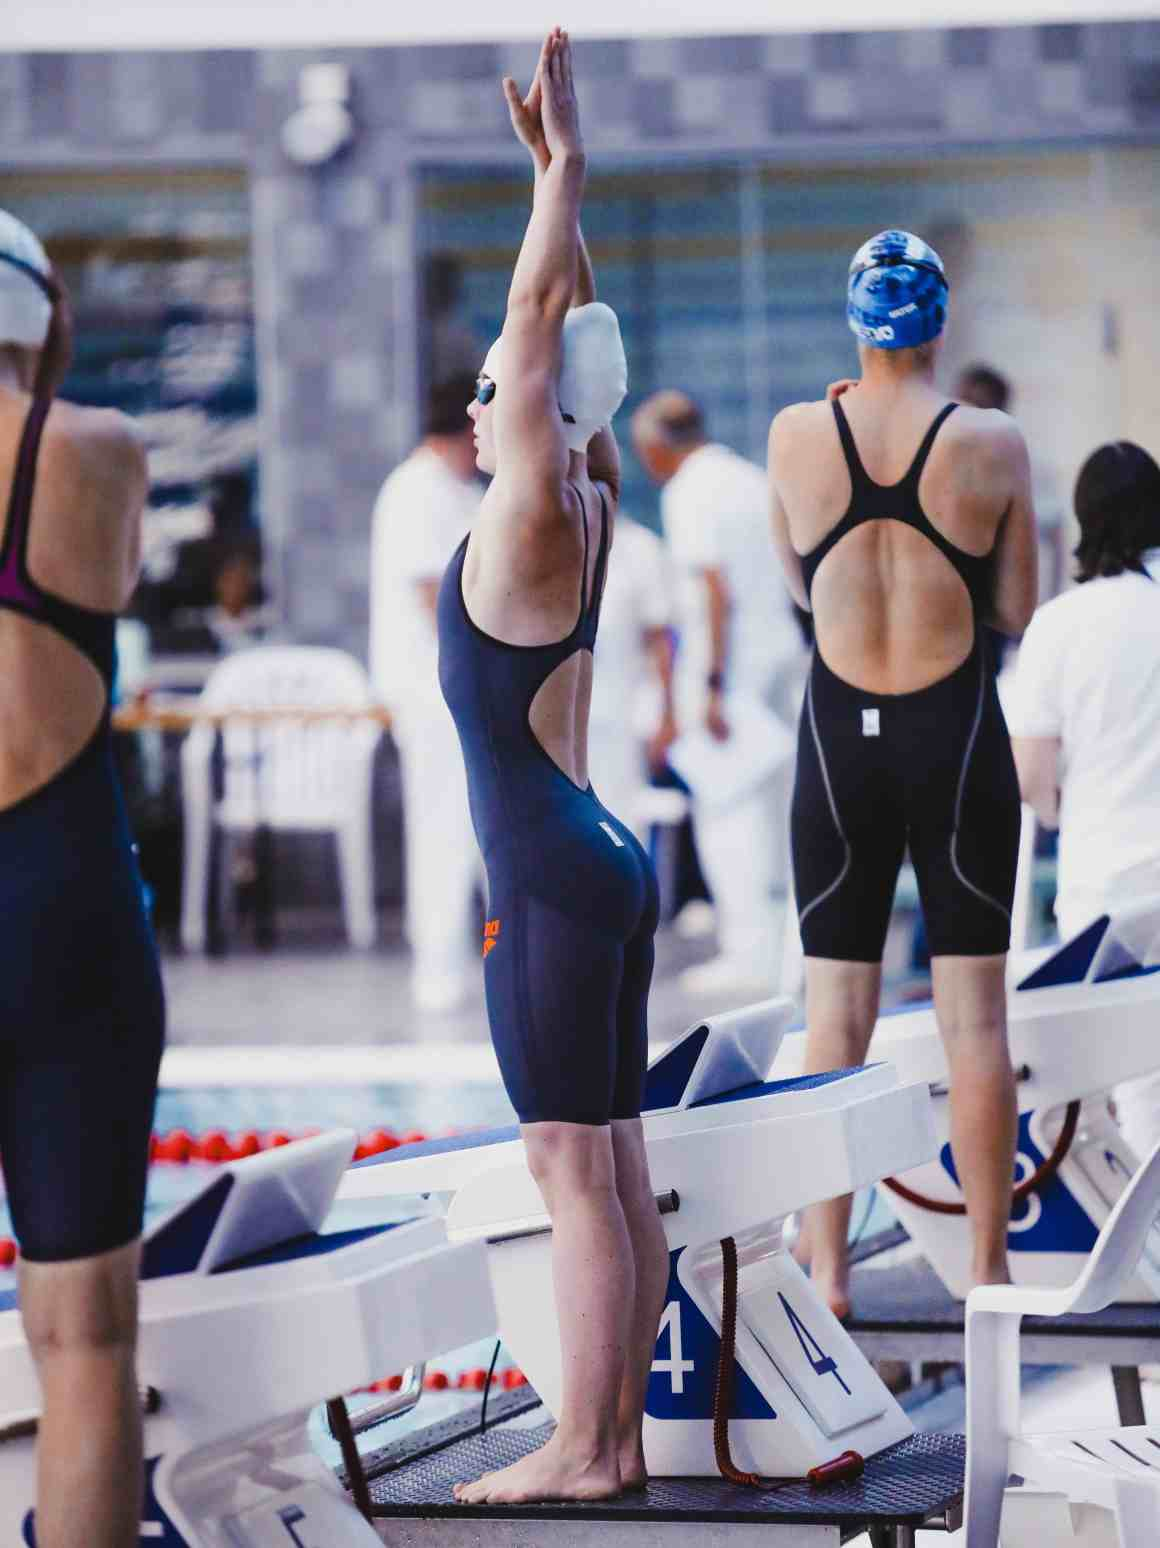 stroomlijn zwemmen oefenen - sneller leren zwemmen